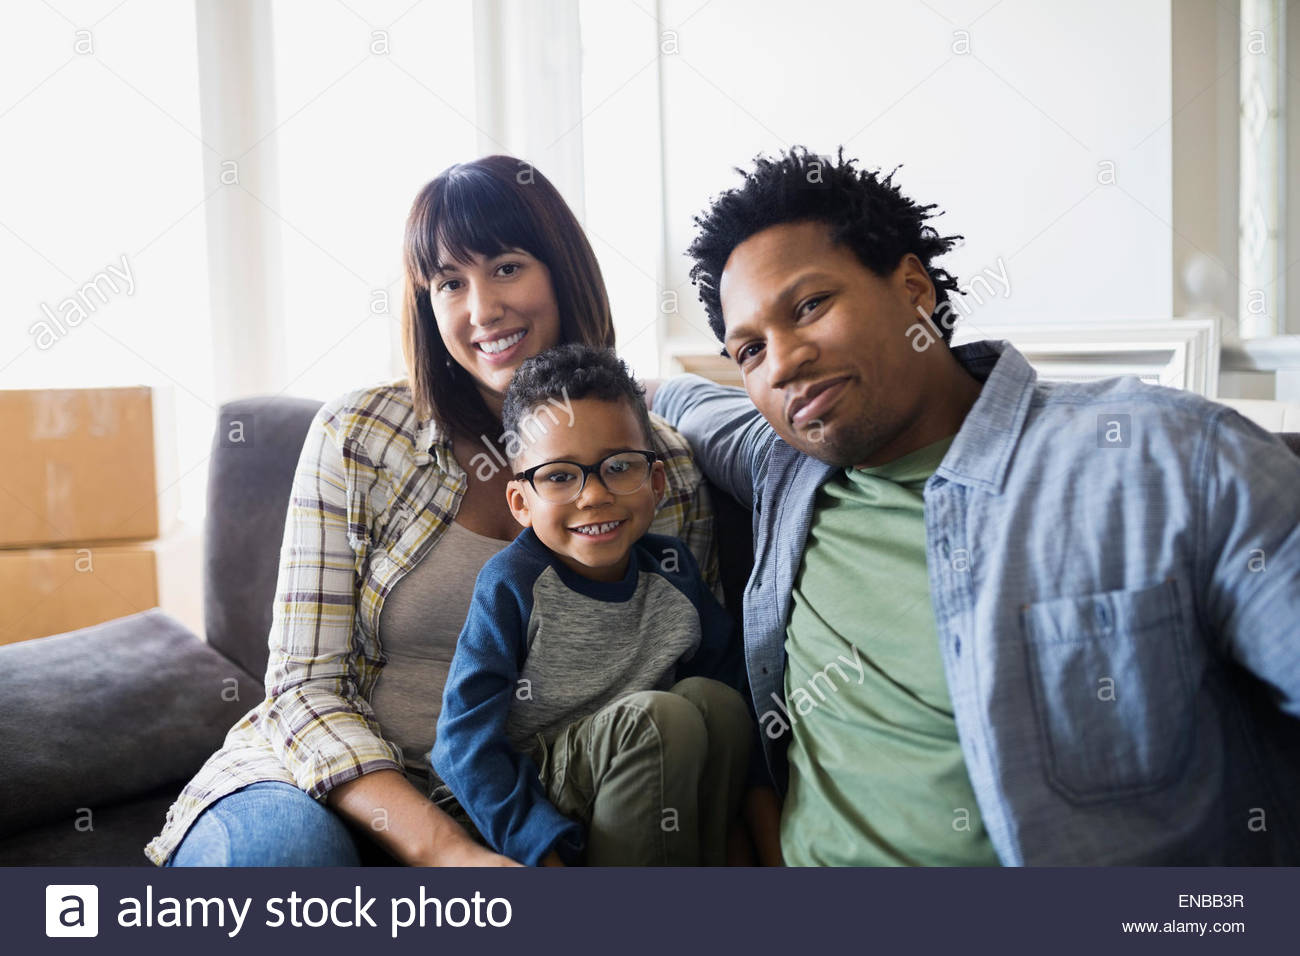 Porträt des Lächelns Familie bewegt sich in Stockbild